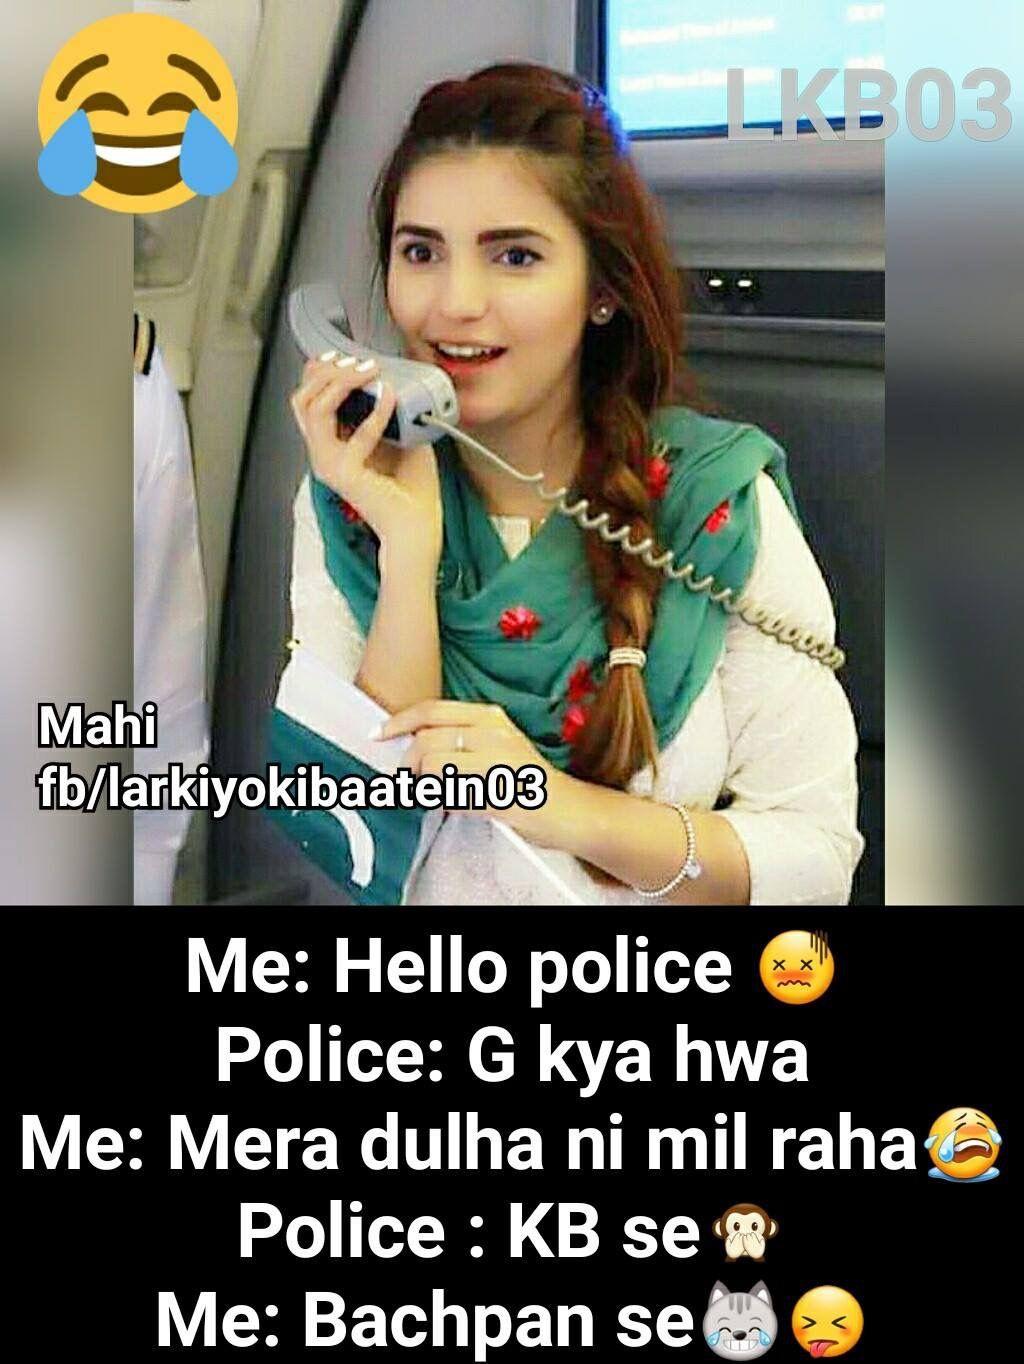 Punjabi Girl With Gun Hd Wallpaper Pin By Nisha Kuar On Beautiful Quotes Pinterest